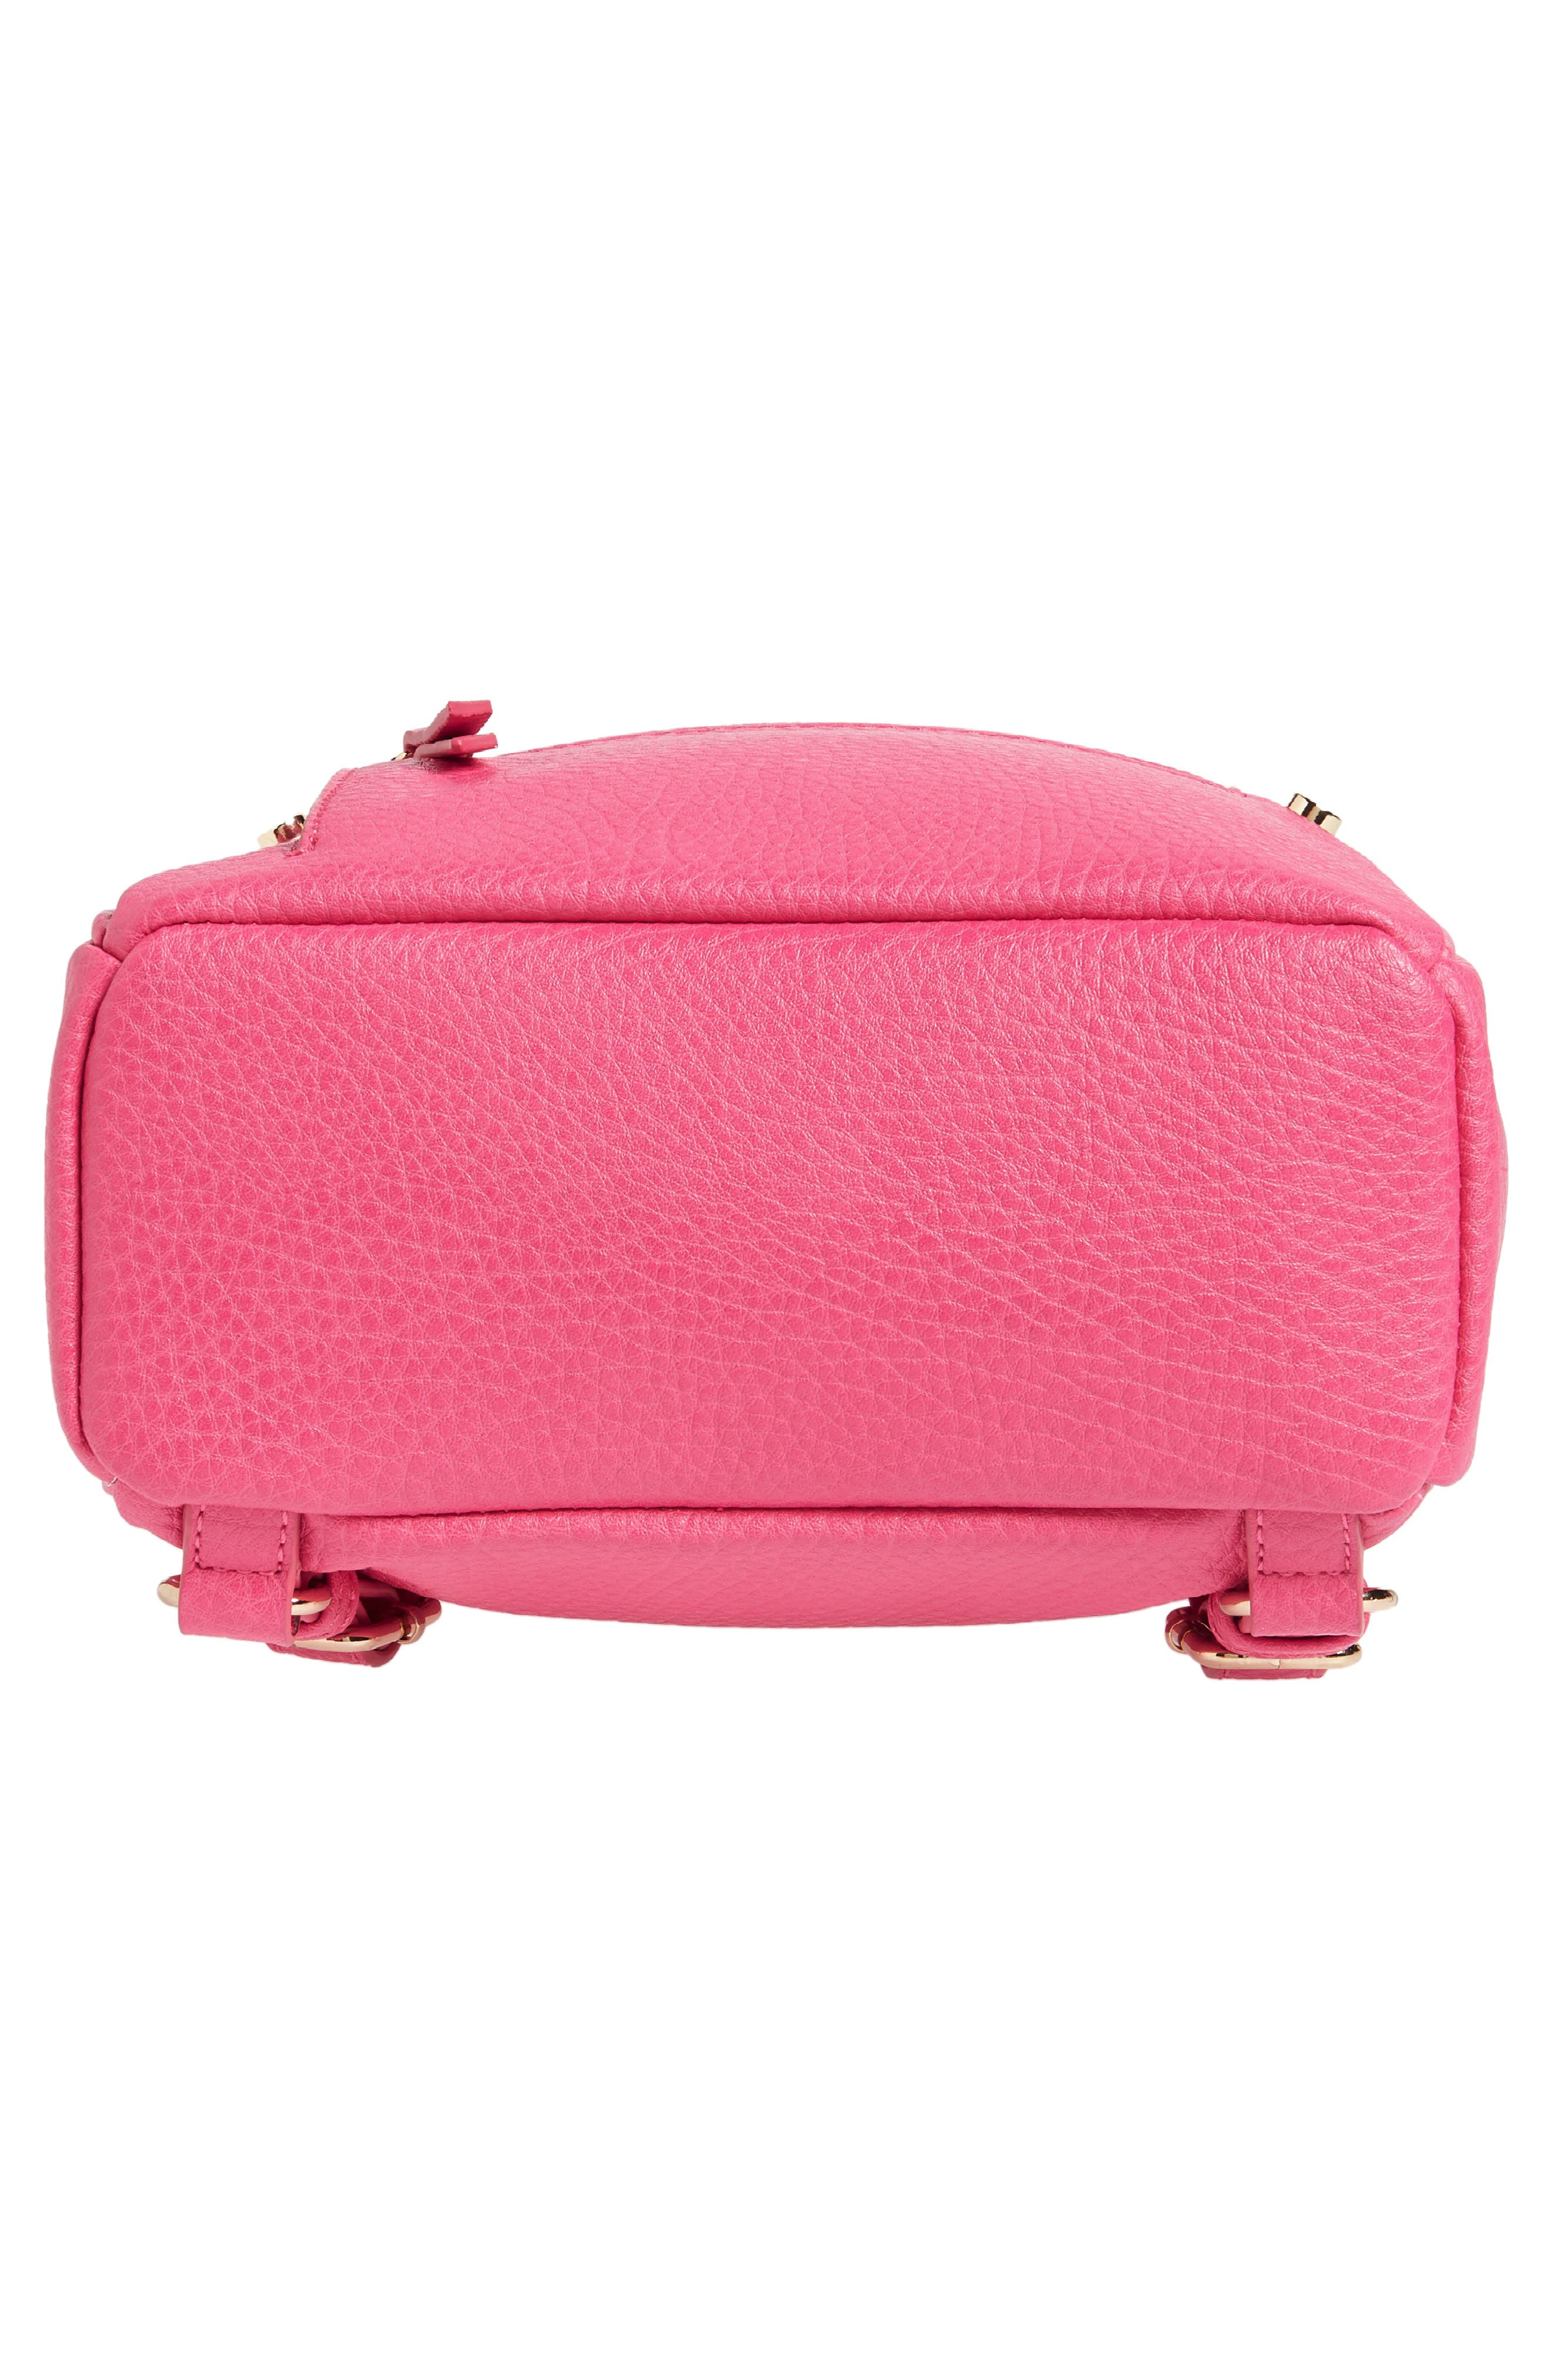 Mali + Lili Hannah Vegan Leather Backpack,                             Alternate thumbnail 6, color,                             Hot Pink